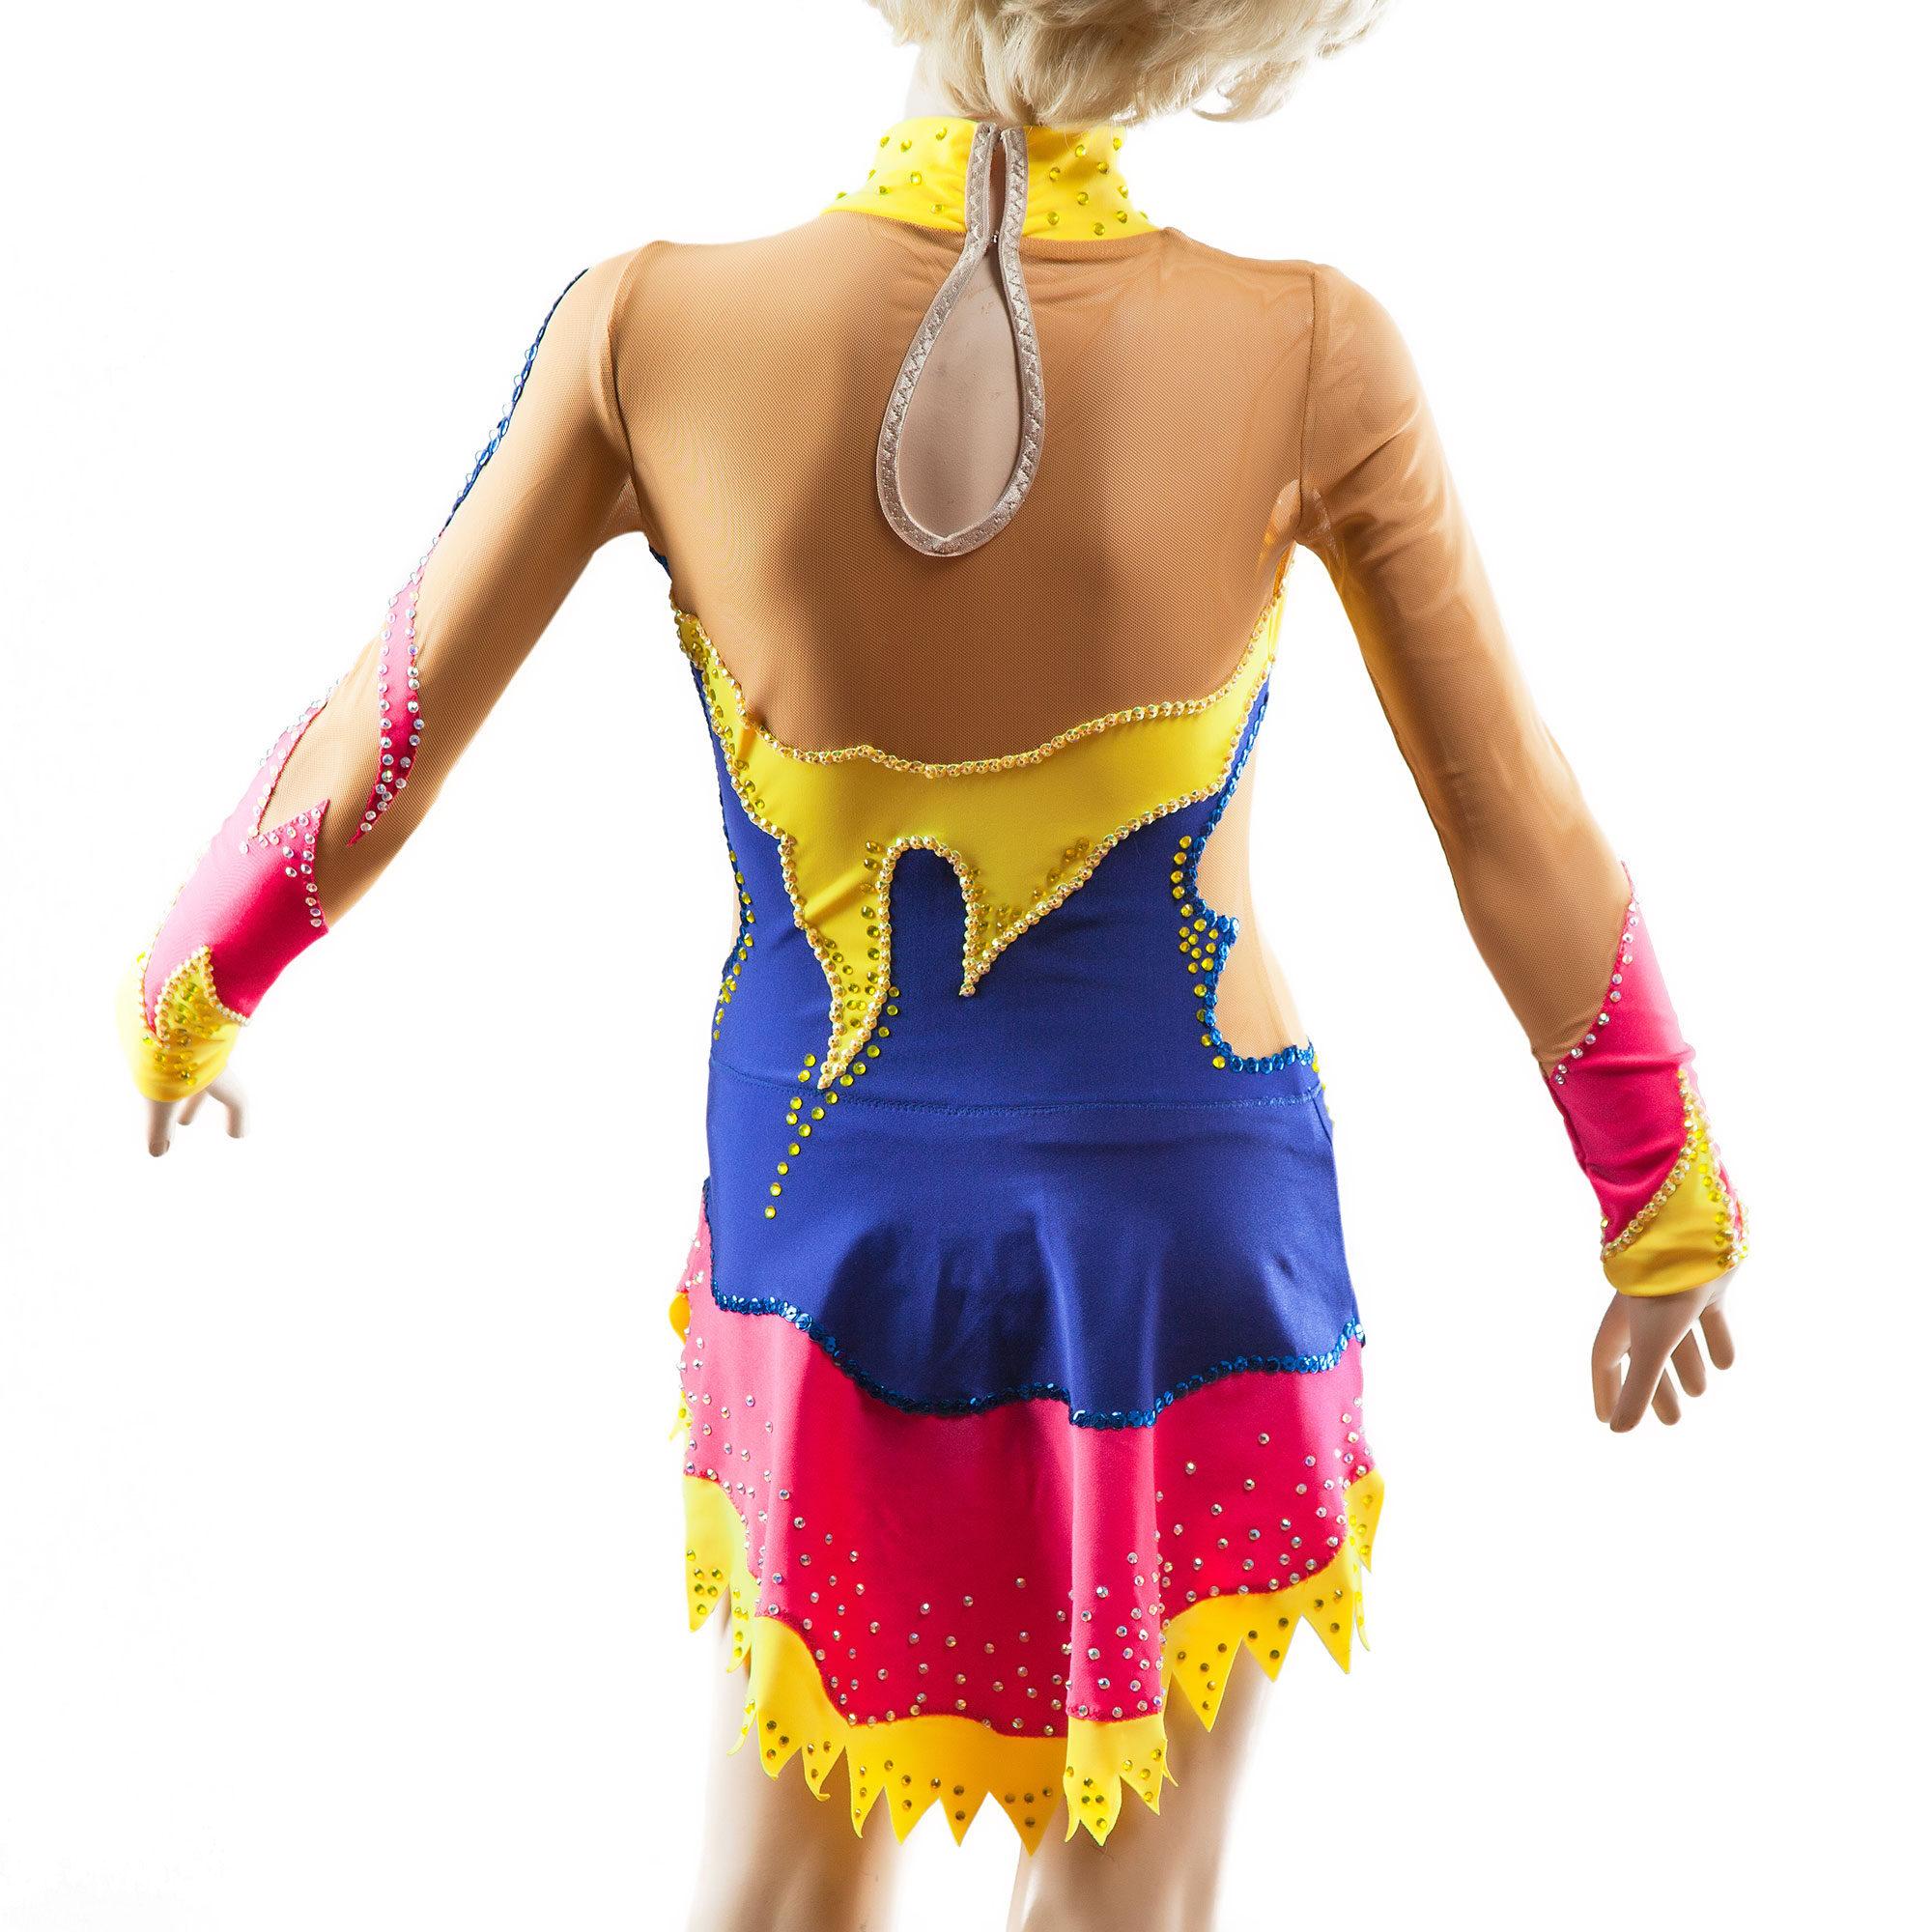 Rhythmic Gymnastics Leotard 69-v2 in blue, crimson, yellow & mesh colors